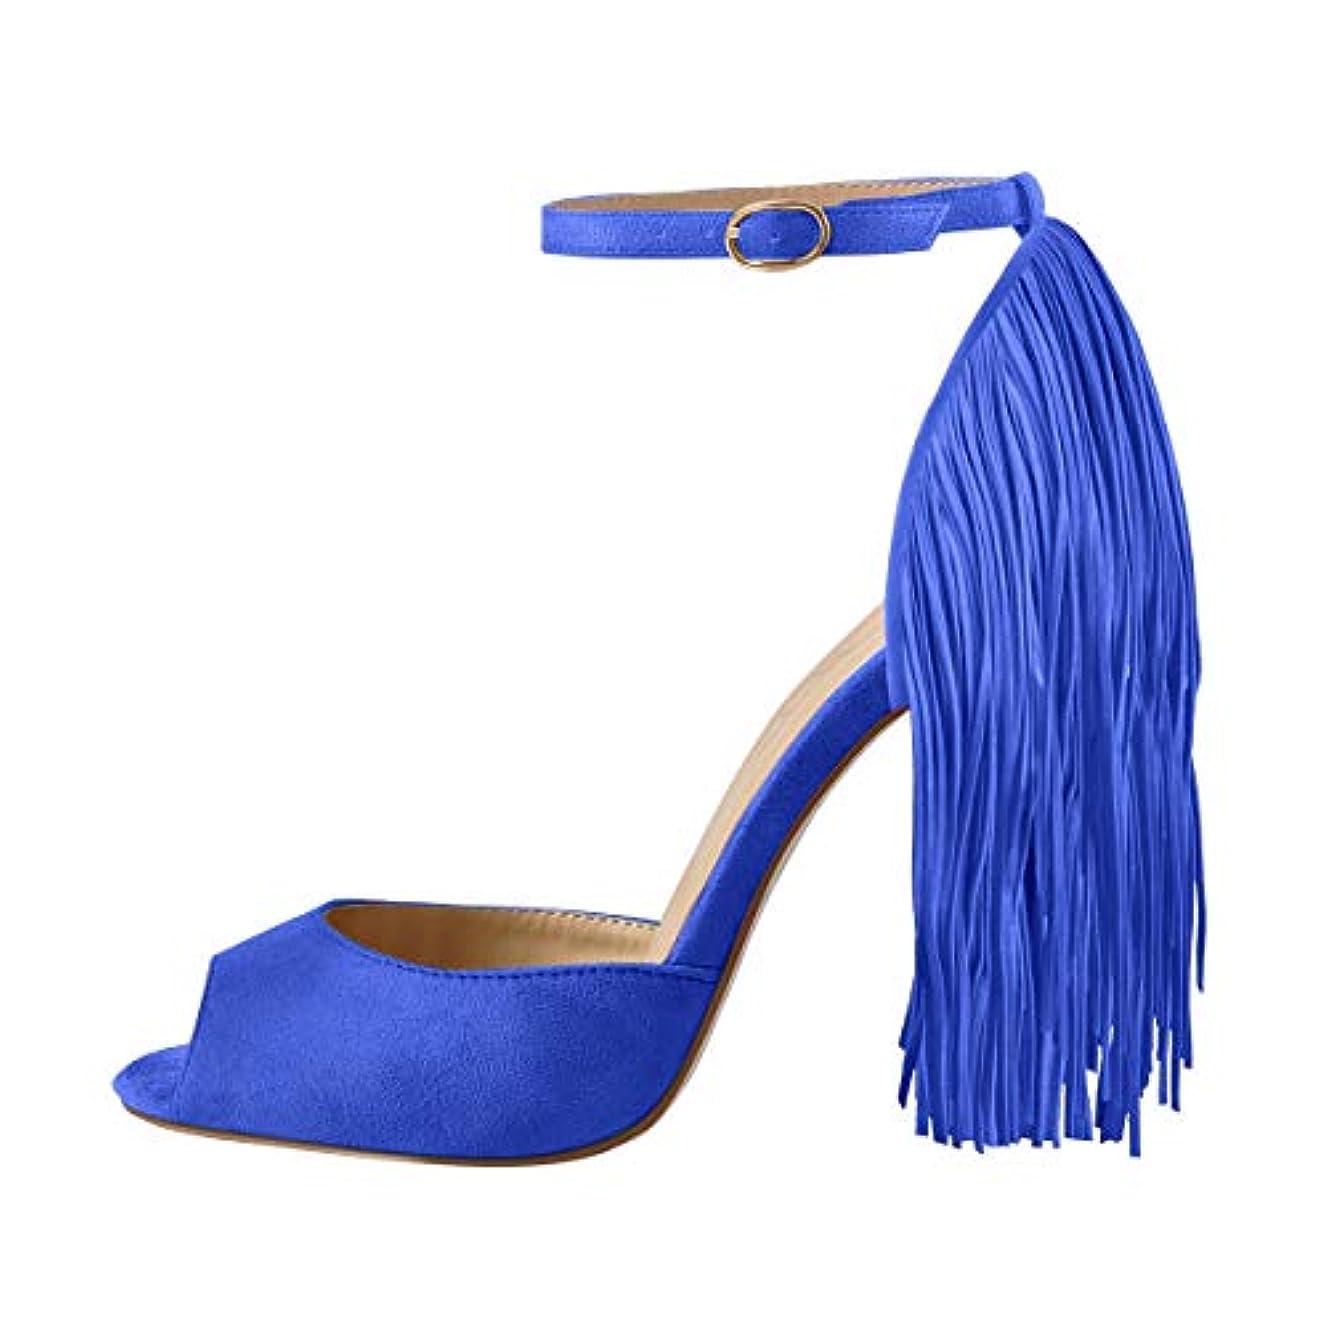 Onlymaker Women's Fringe Decoration Peep Toe High Heel Sandal Ankle Buckle Big Size for Party